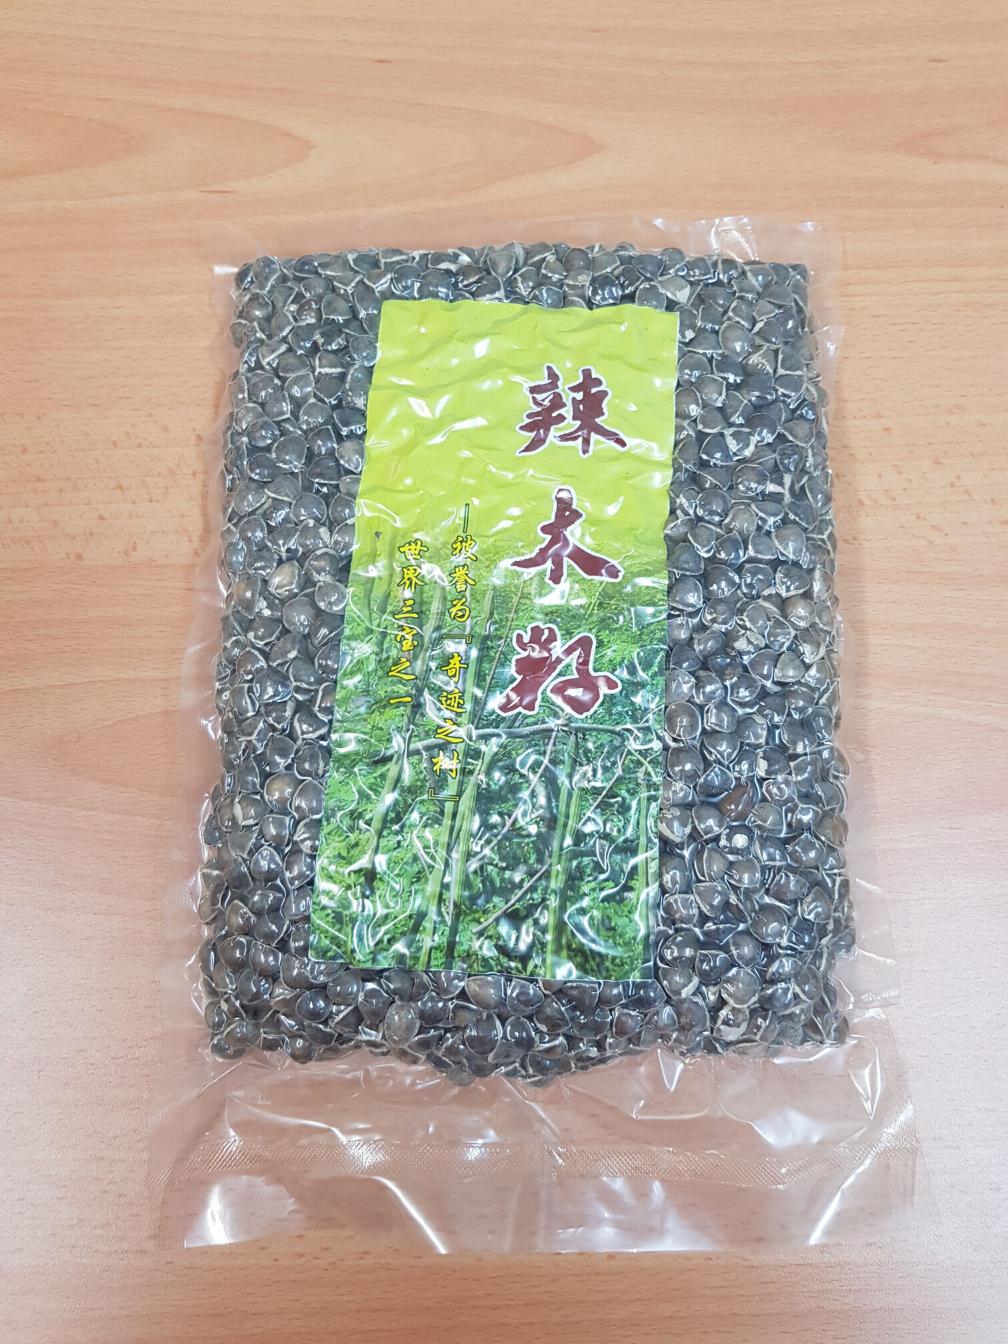 辣木籽 马来西亚 Moringa Seeds Malaysia (1).png